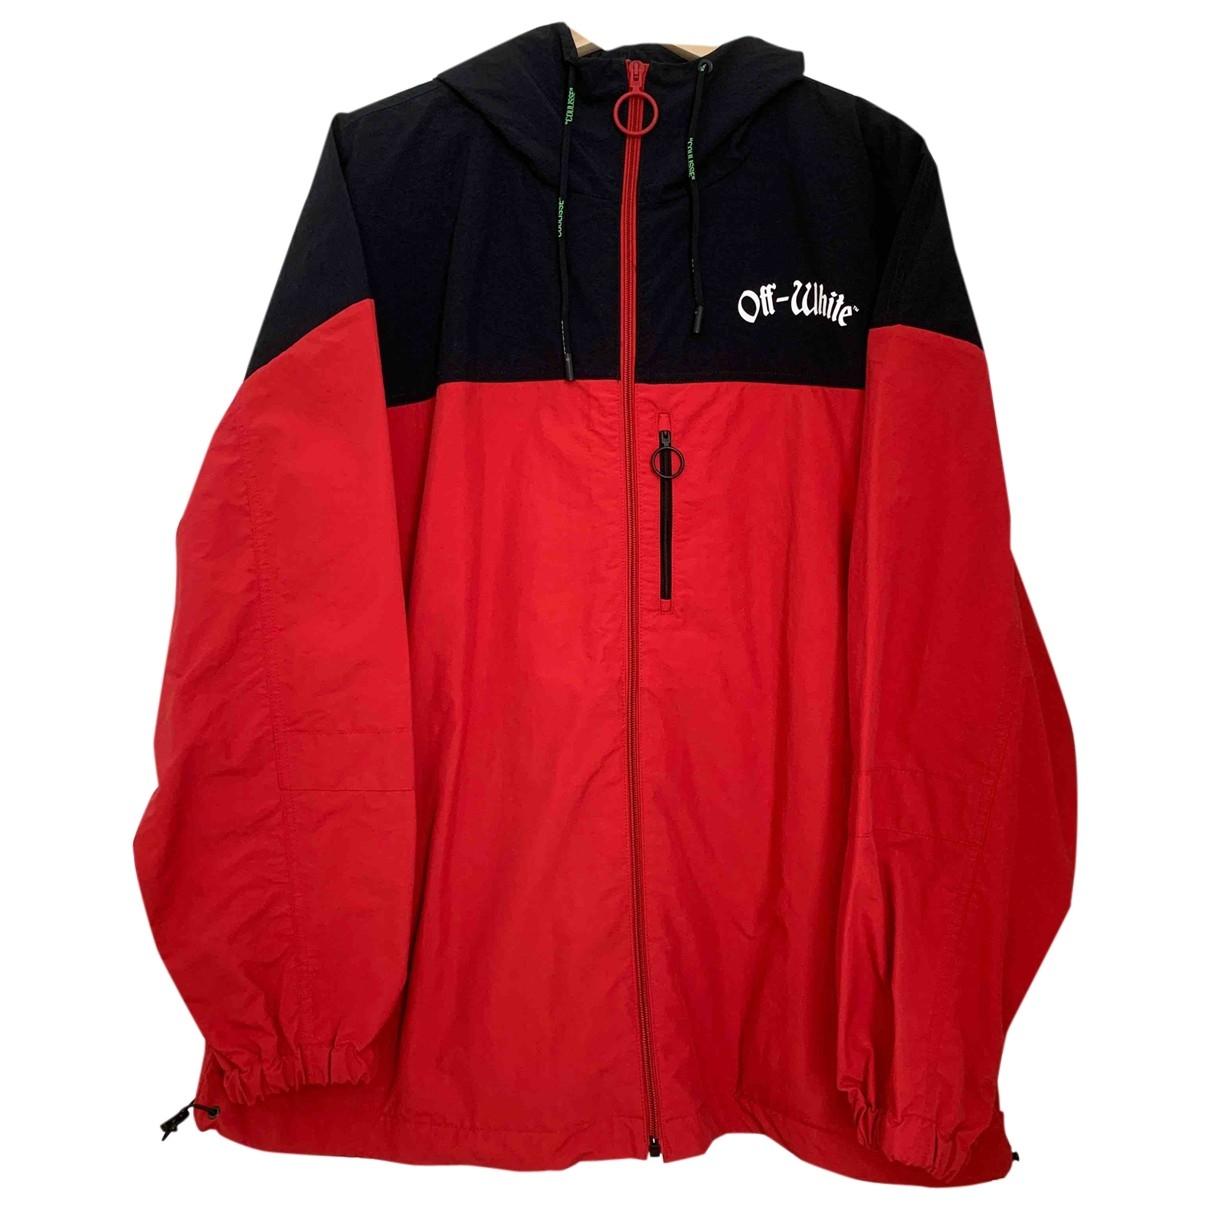 Off-white \N Red jacket  for Men S International